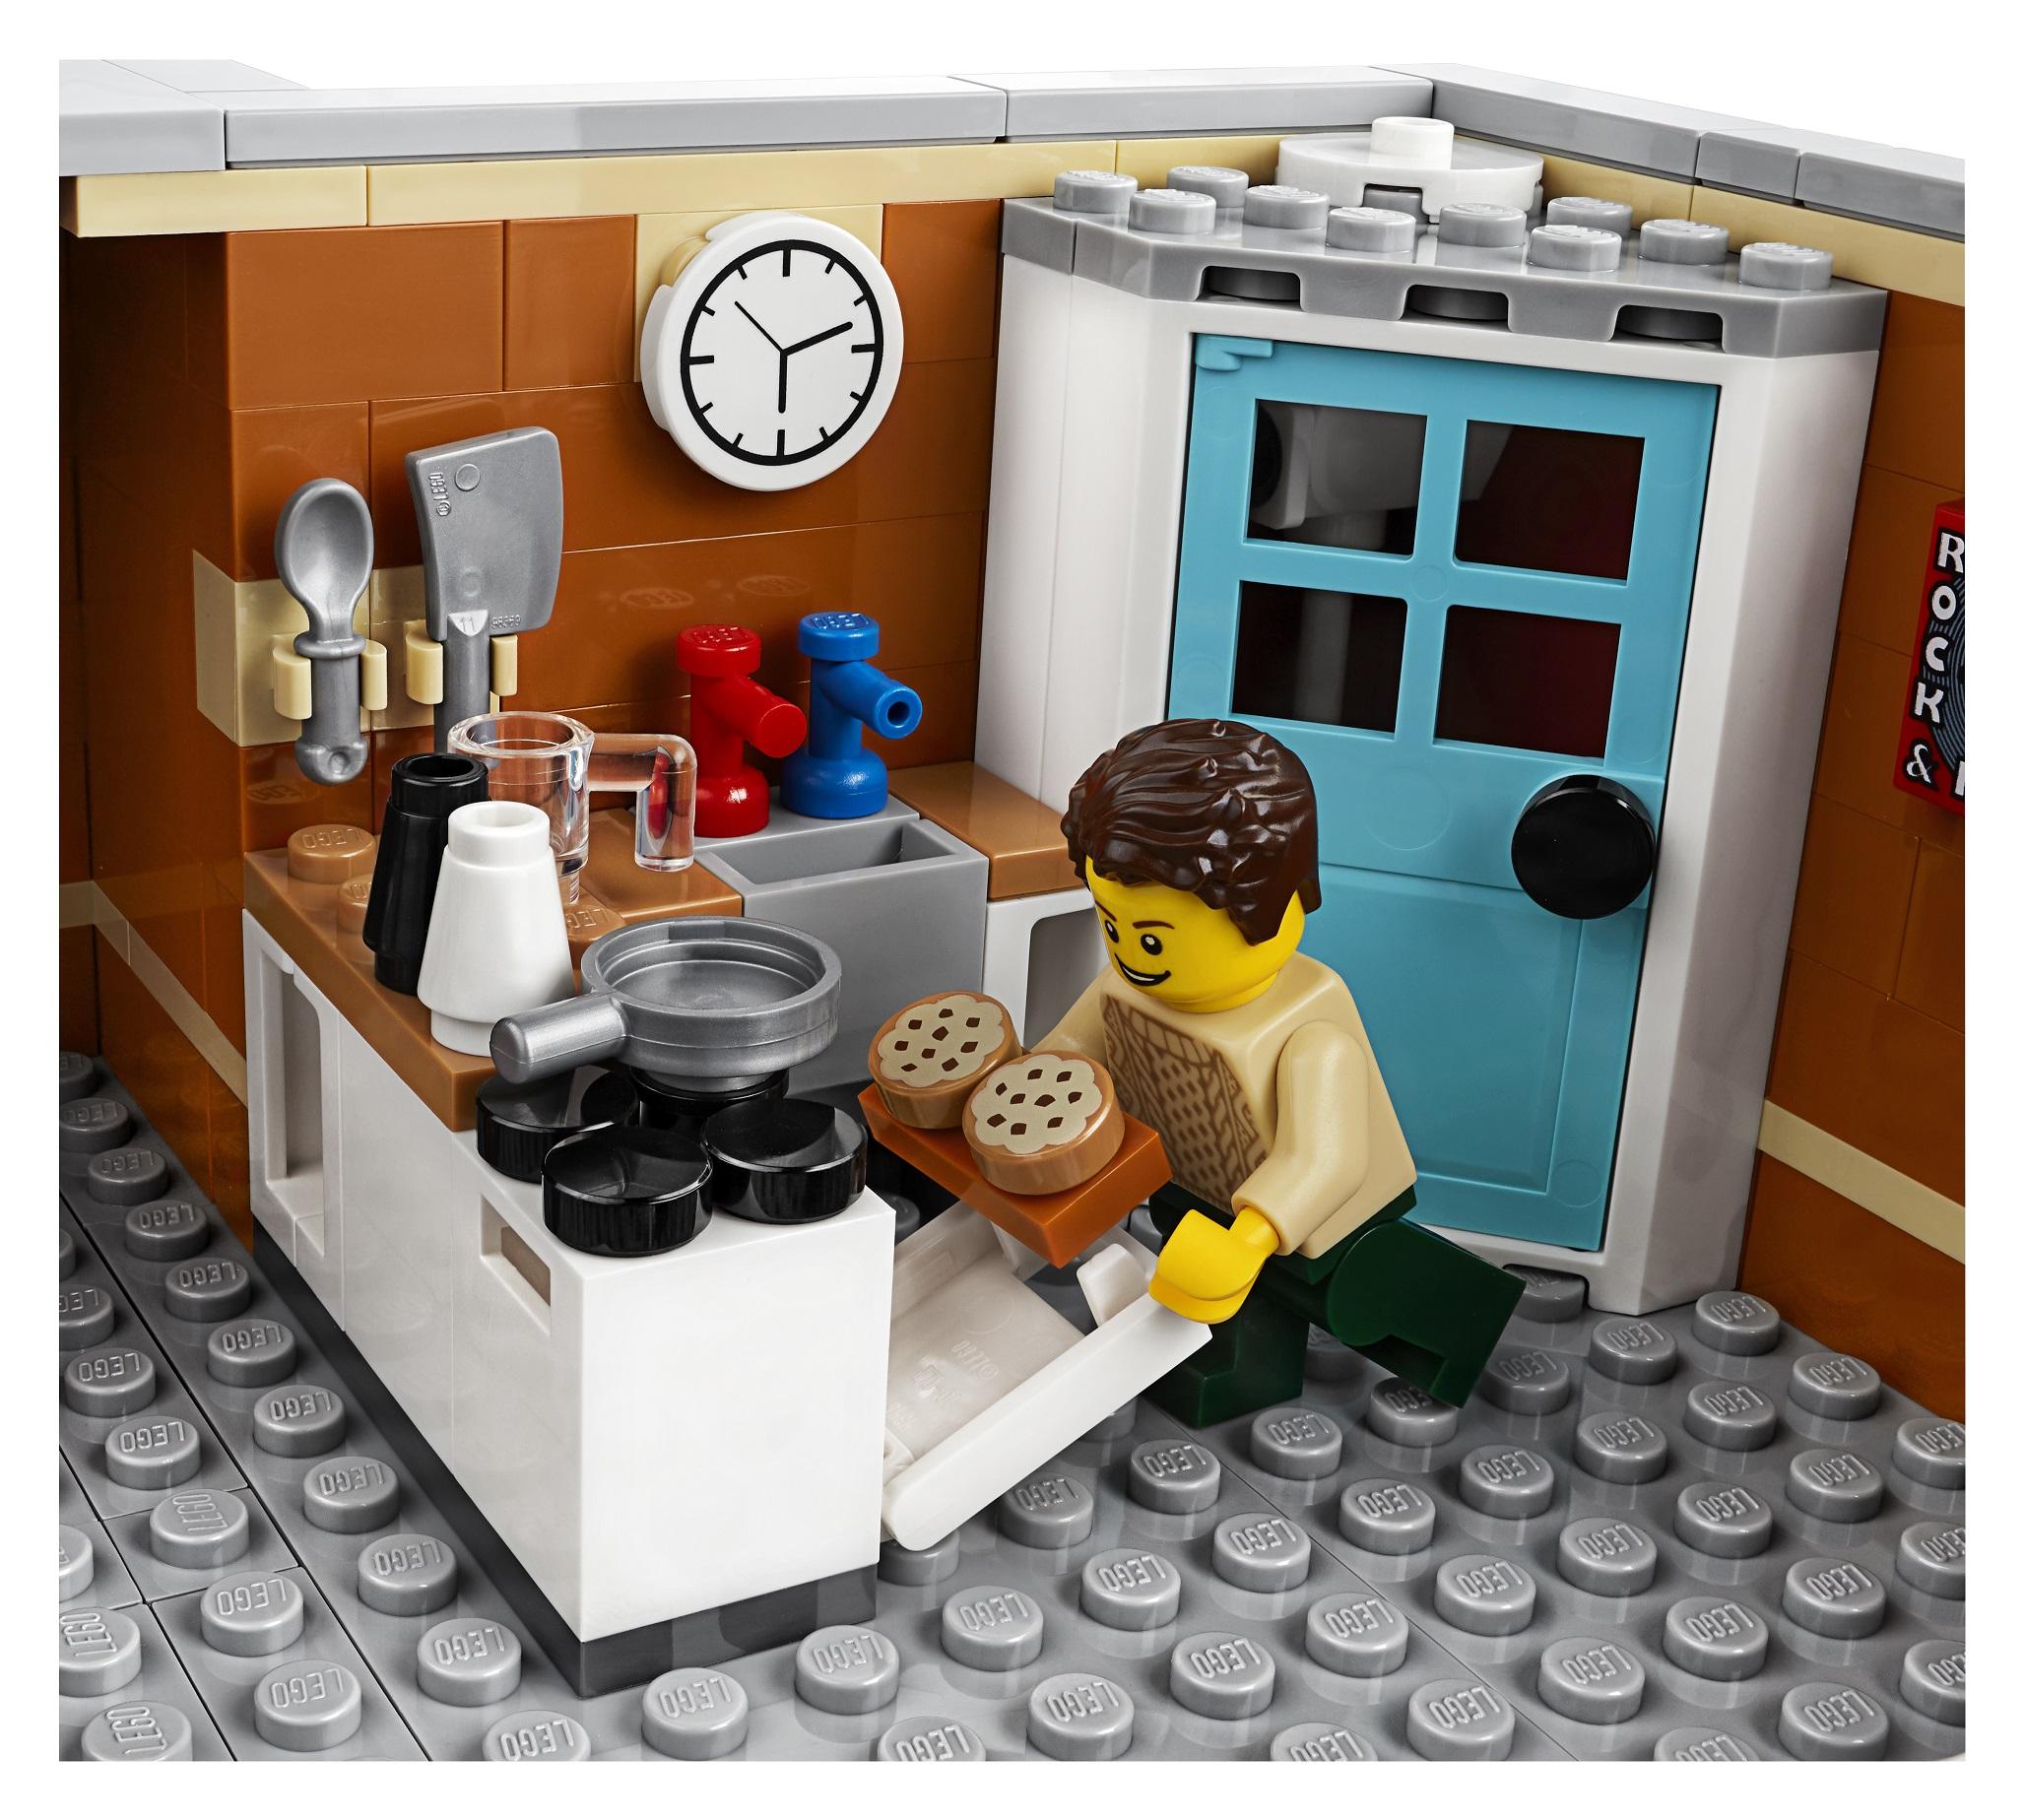 Presenting 10264 Corner Garage The 2019 Lego Modular